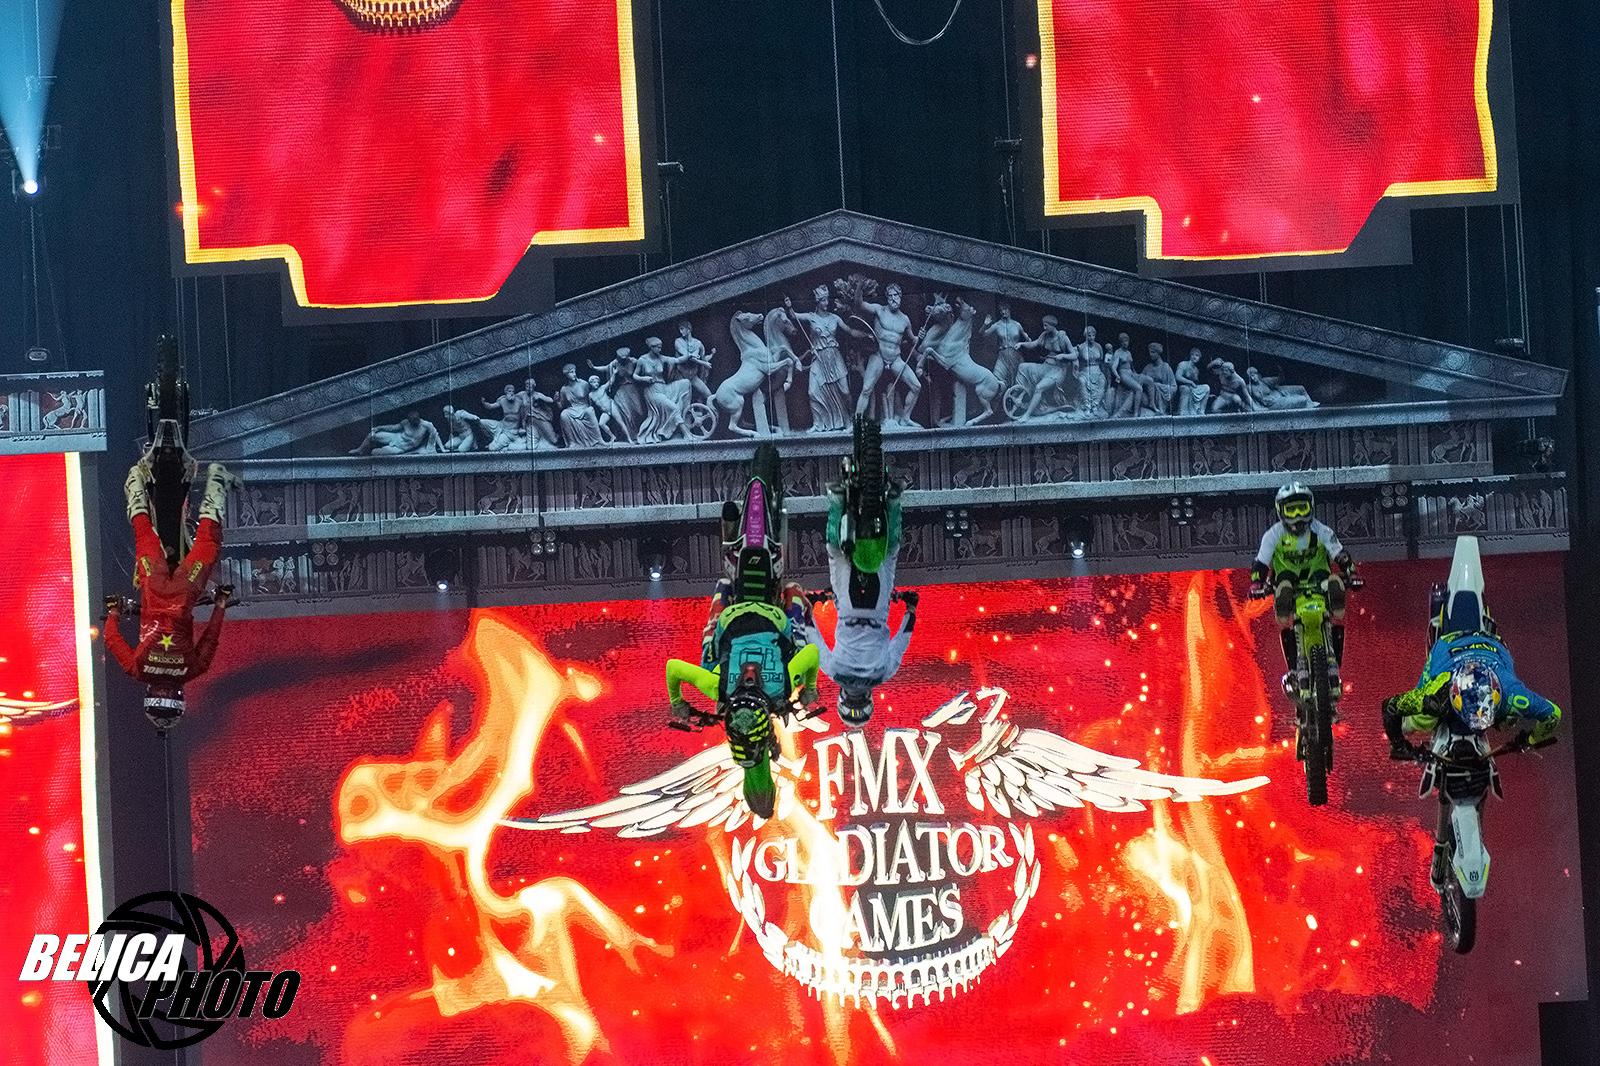 Fotogalerie FMX Gladiator Games 2018 od Dušana Belicy